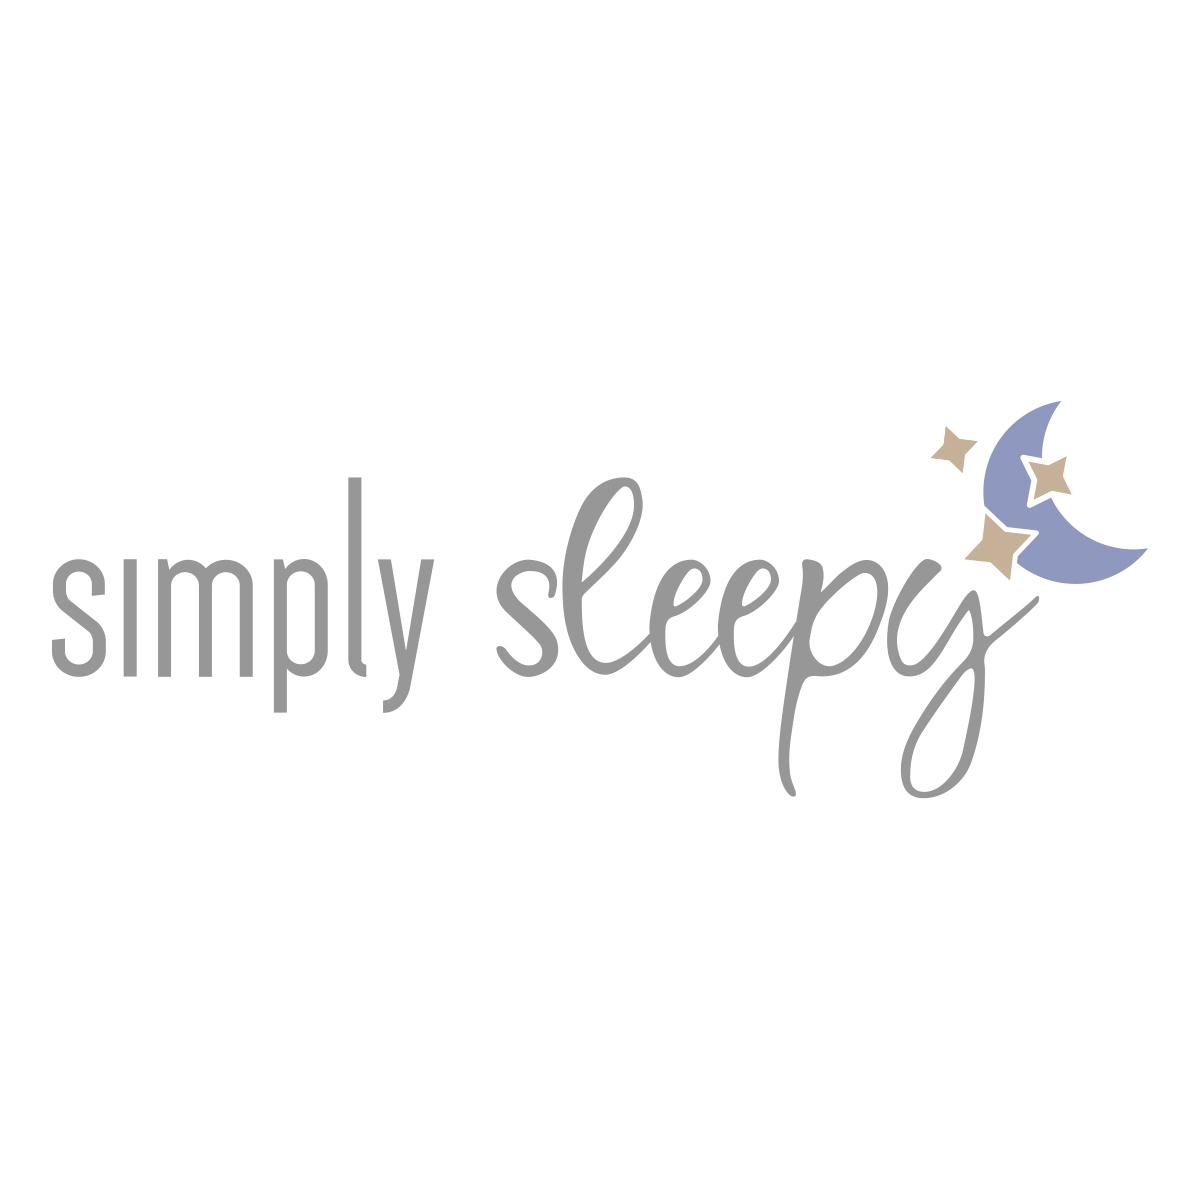 simply_sleepy_logo